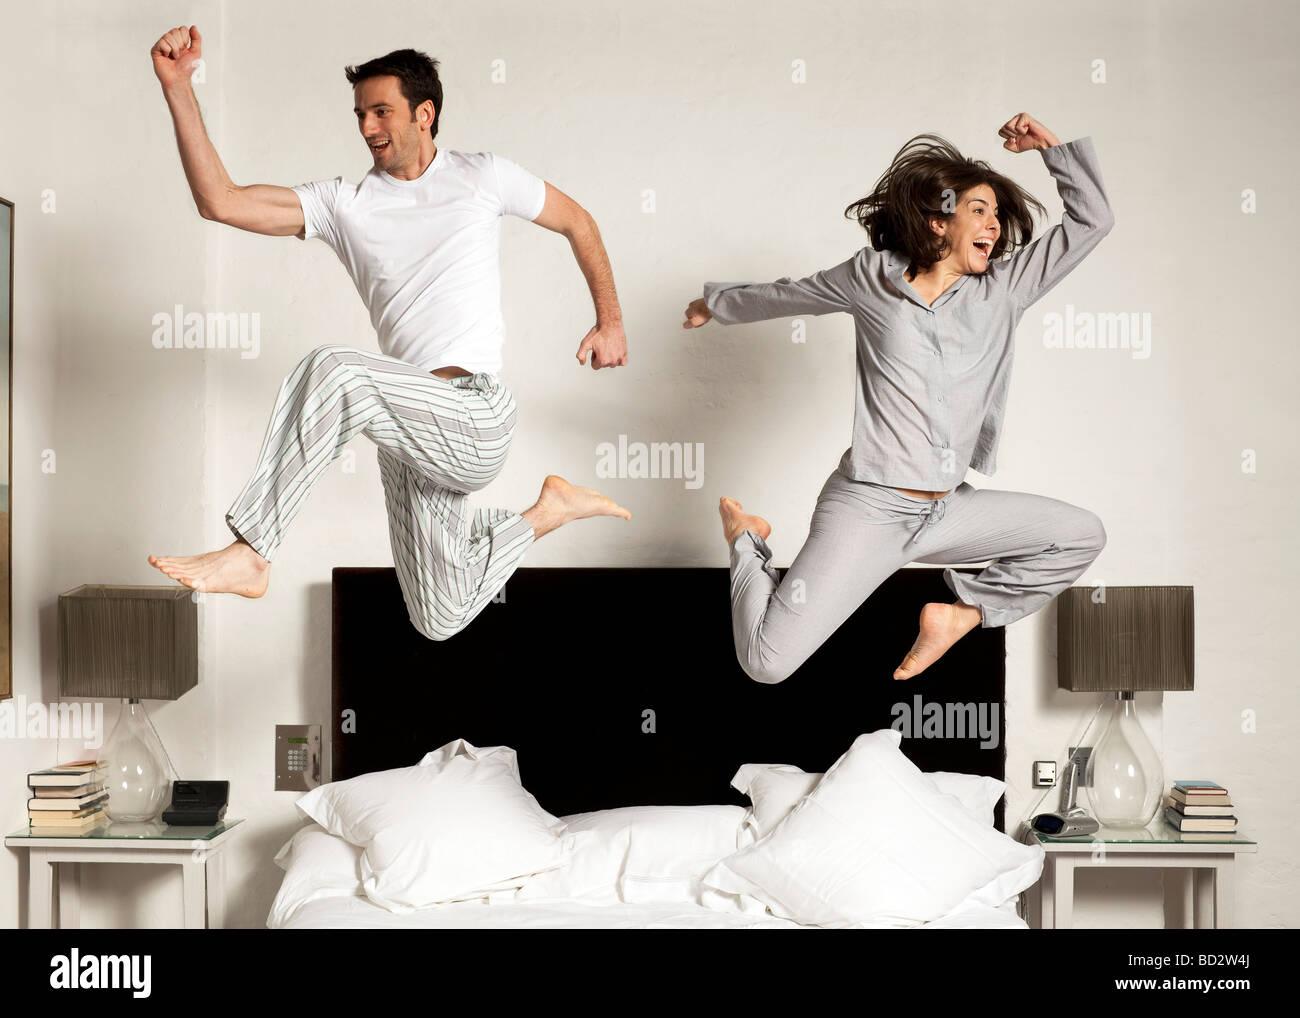 paar aus dem Bett springen Stockbild